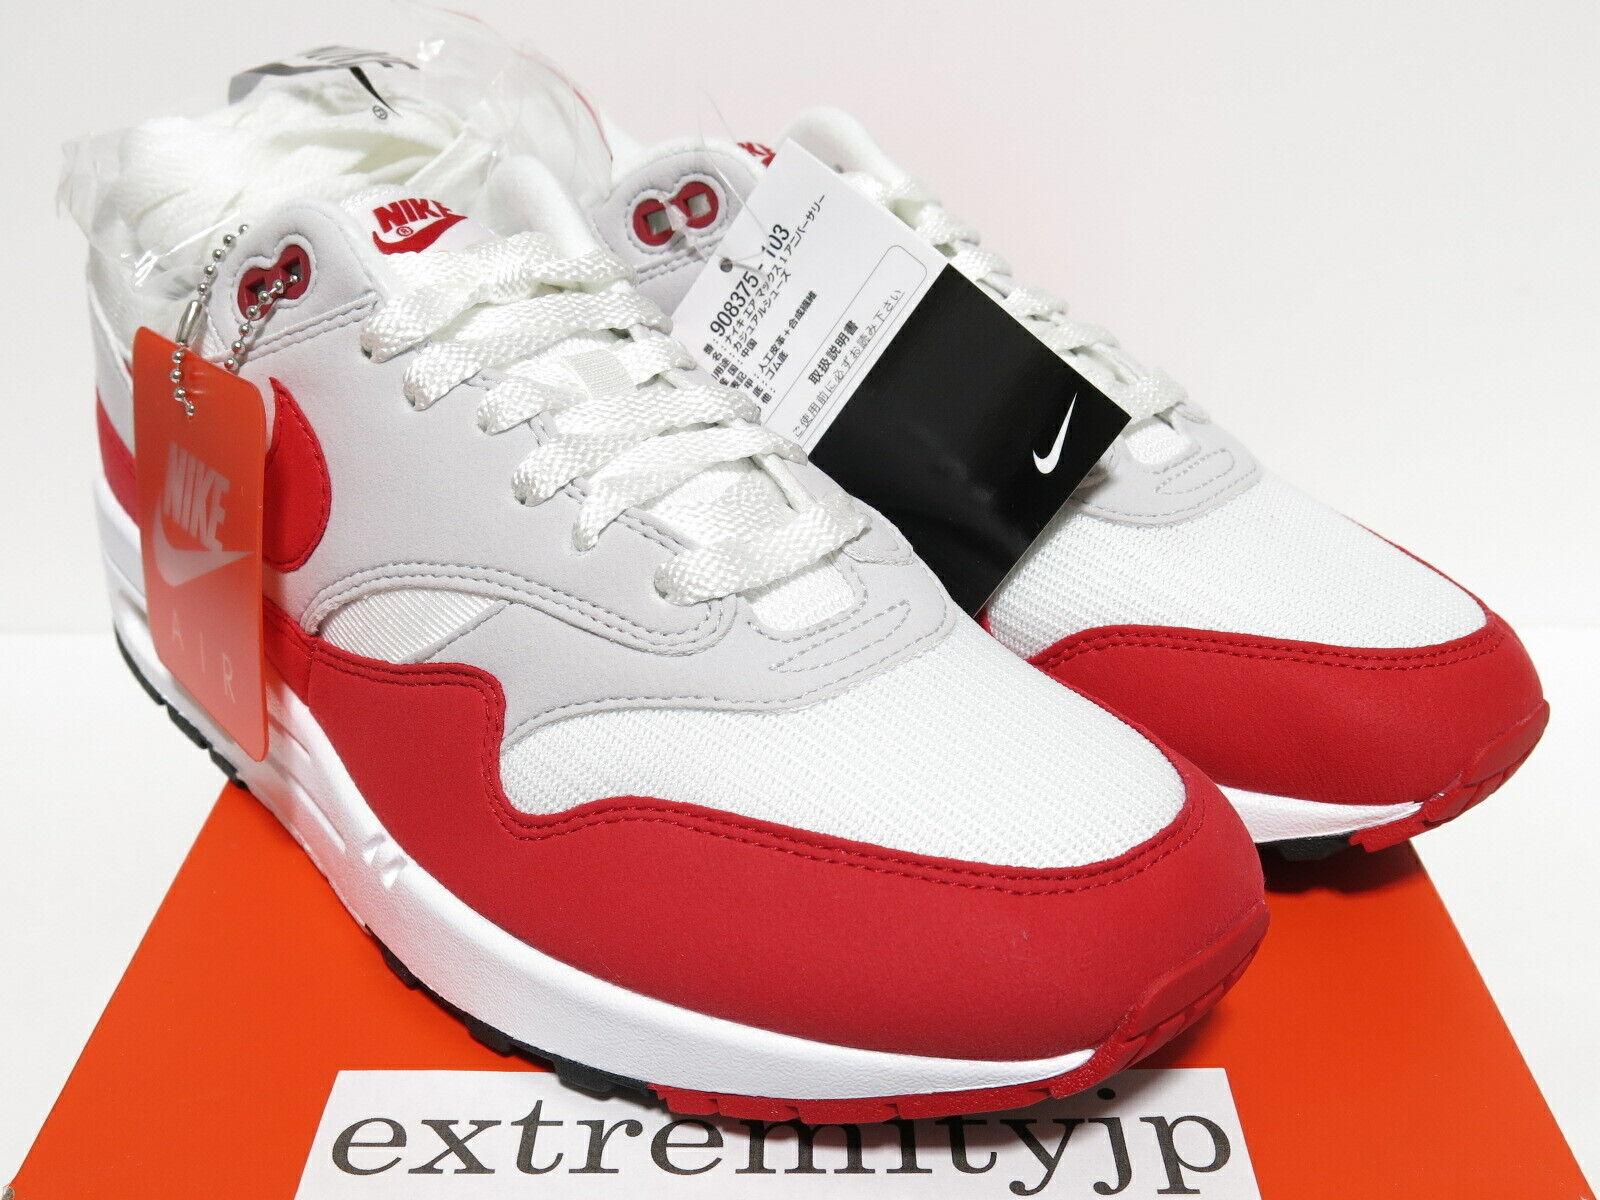 DS 2017 NIKE AIR MAX 1 ANNIVERSARY white university red 908375-103 sz 9